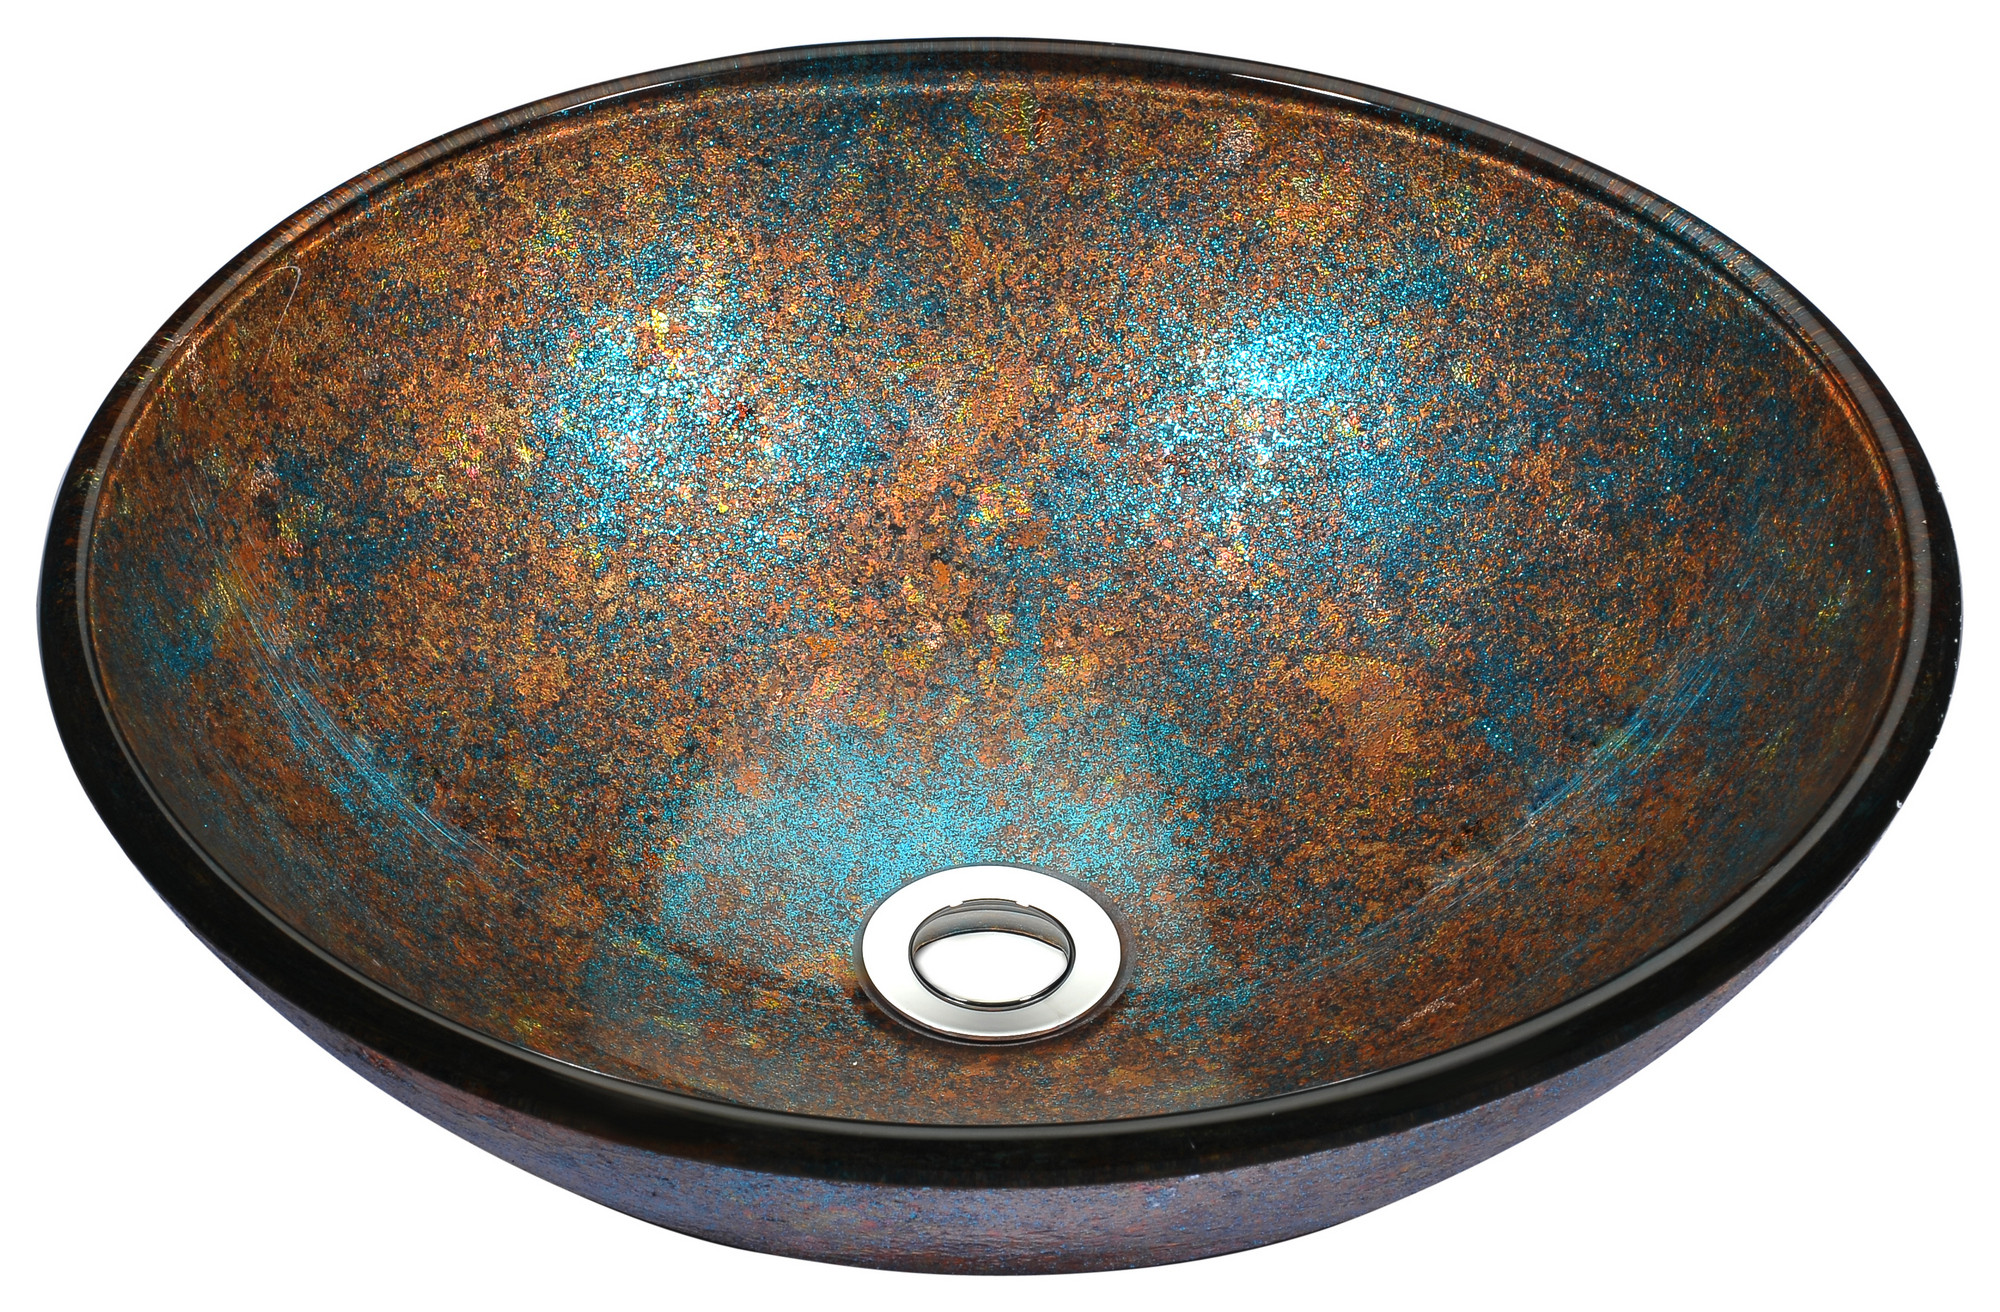 ANZZI LS-AZ172 Stellar Series Deco-Glass Vessel Sink In Emerald Burst